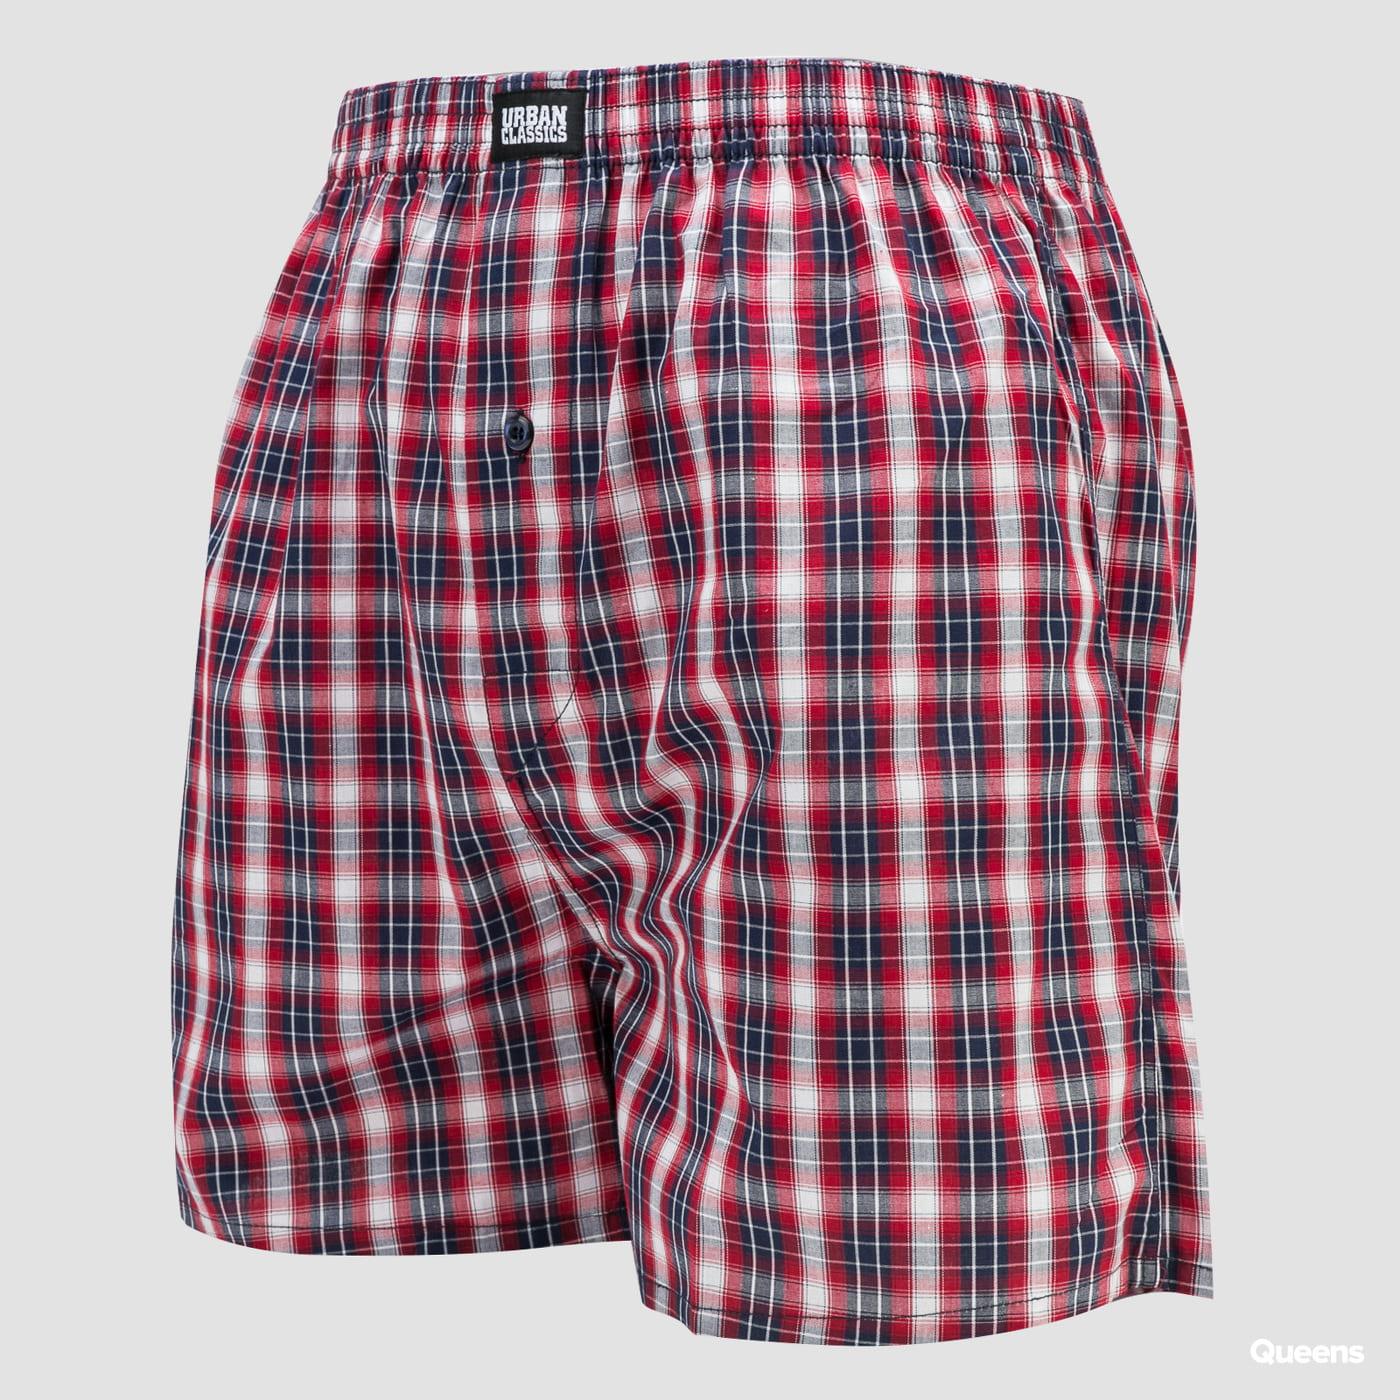 Urban Classics Woven Plaid Boxer Shorts 2-Pack navy / červené / biele